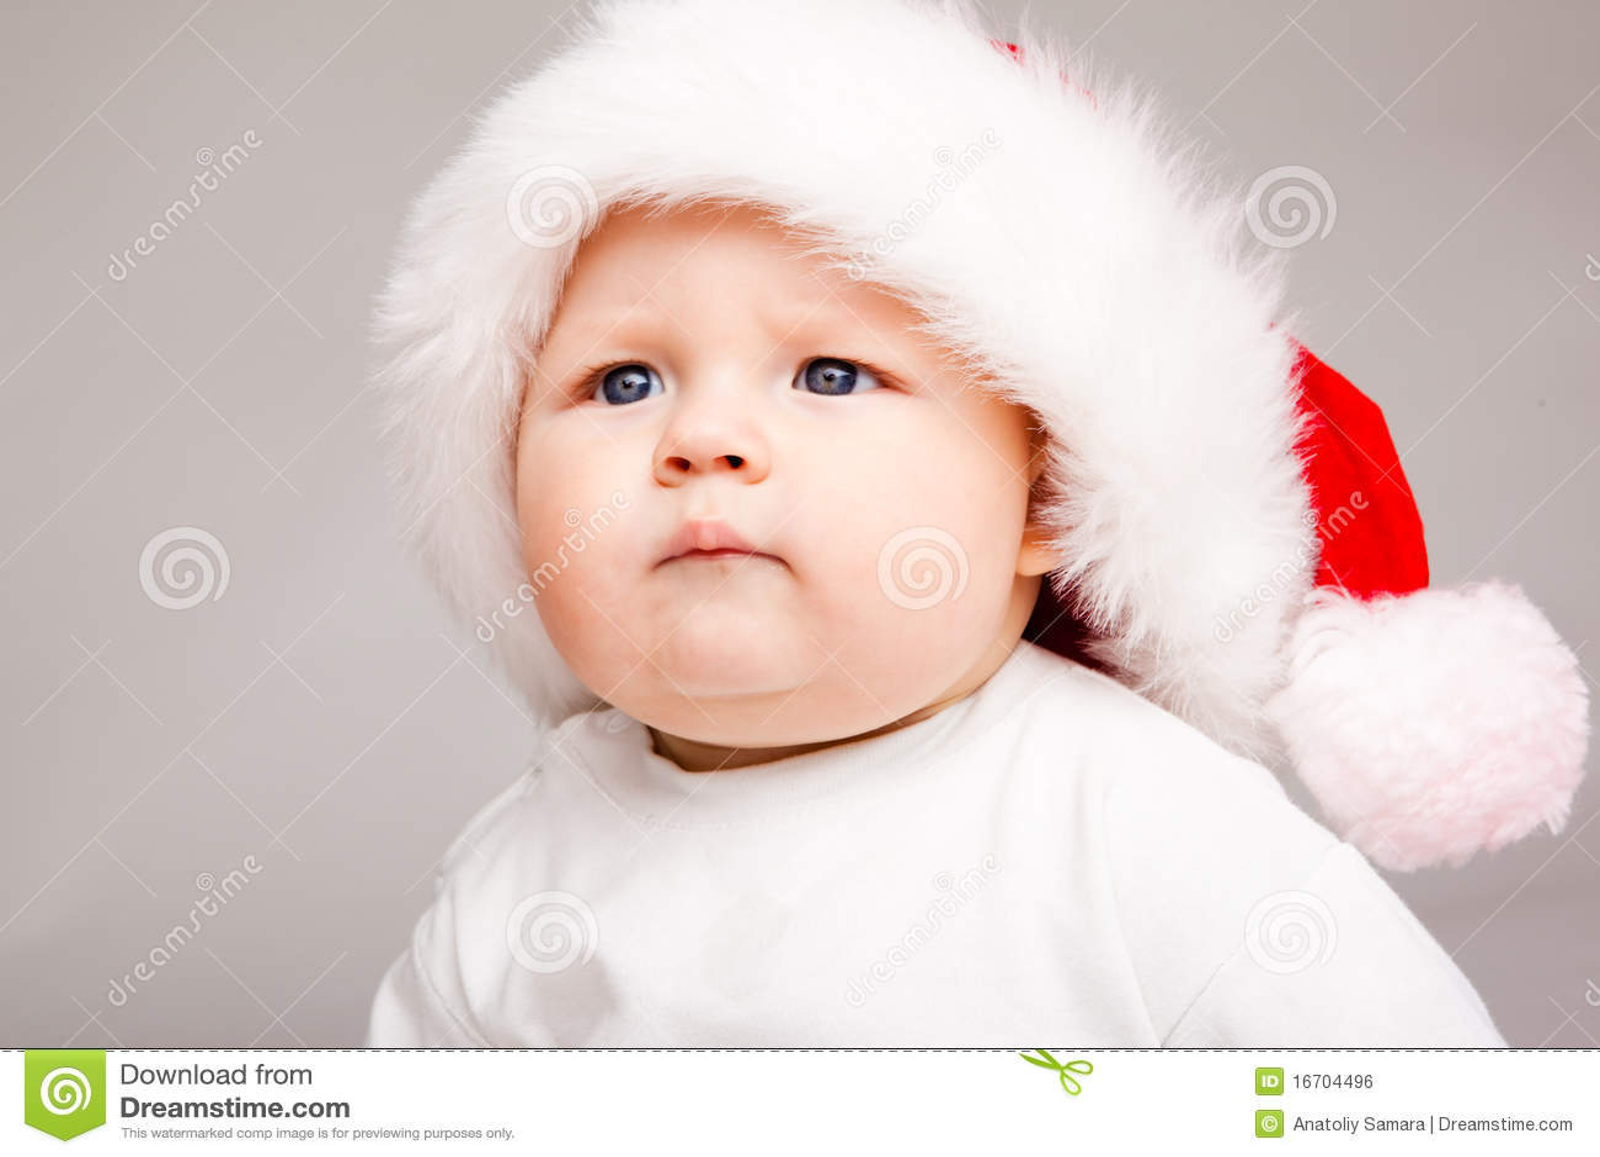 0daa20f73 Cute Santa baby stock photo. Image of isolated, child - 16704496